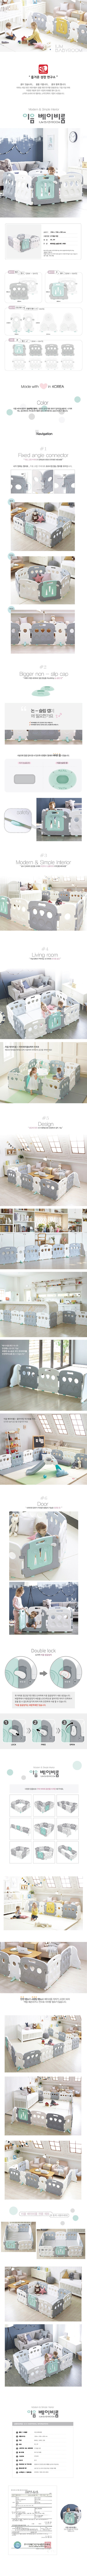 ium babyroom 1.jpg